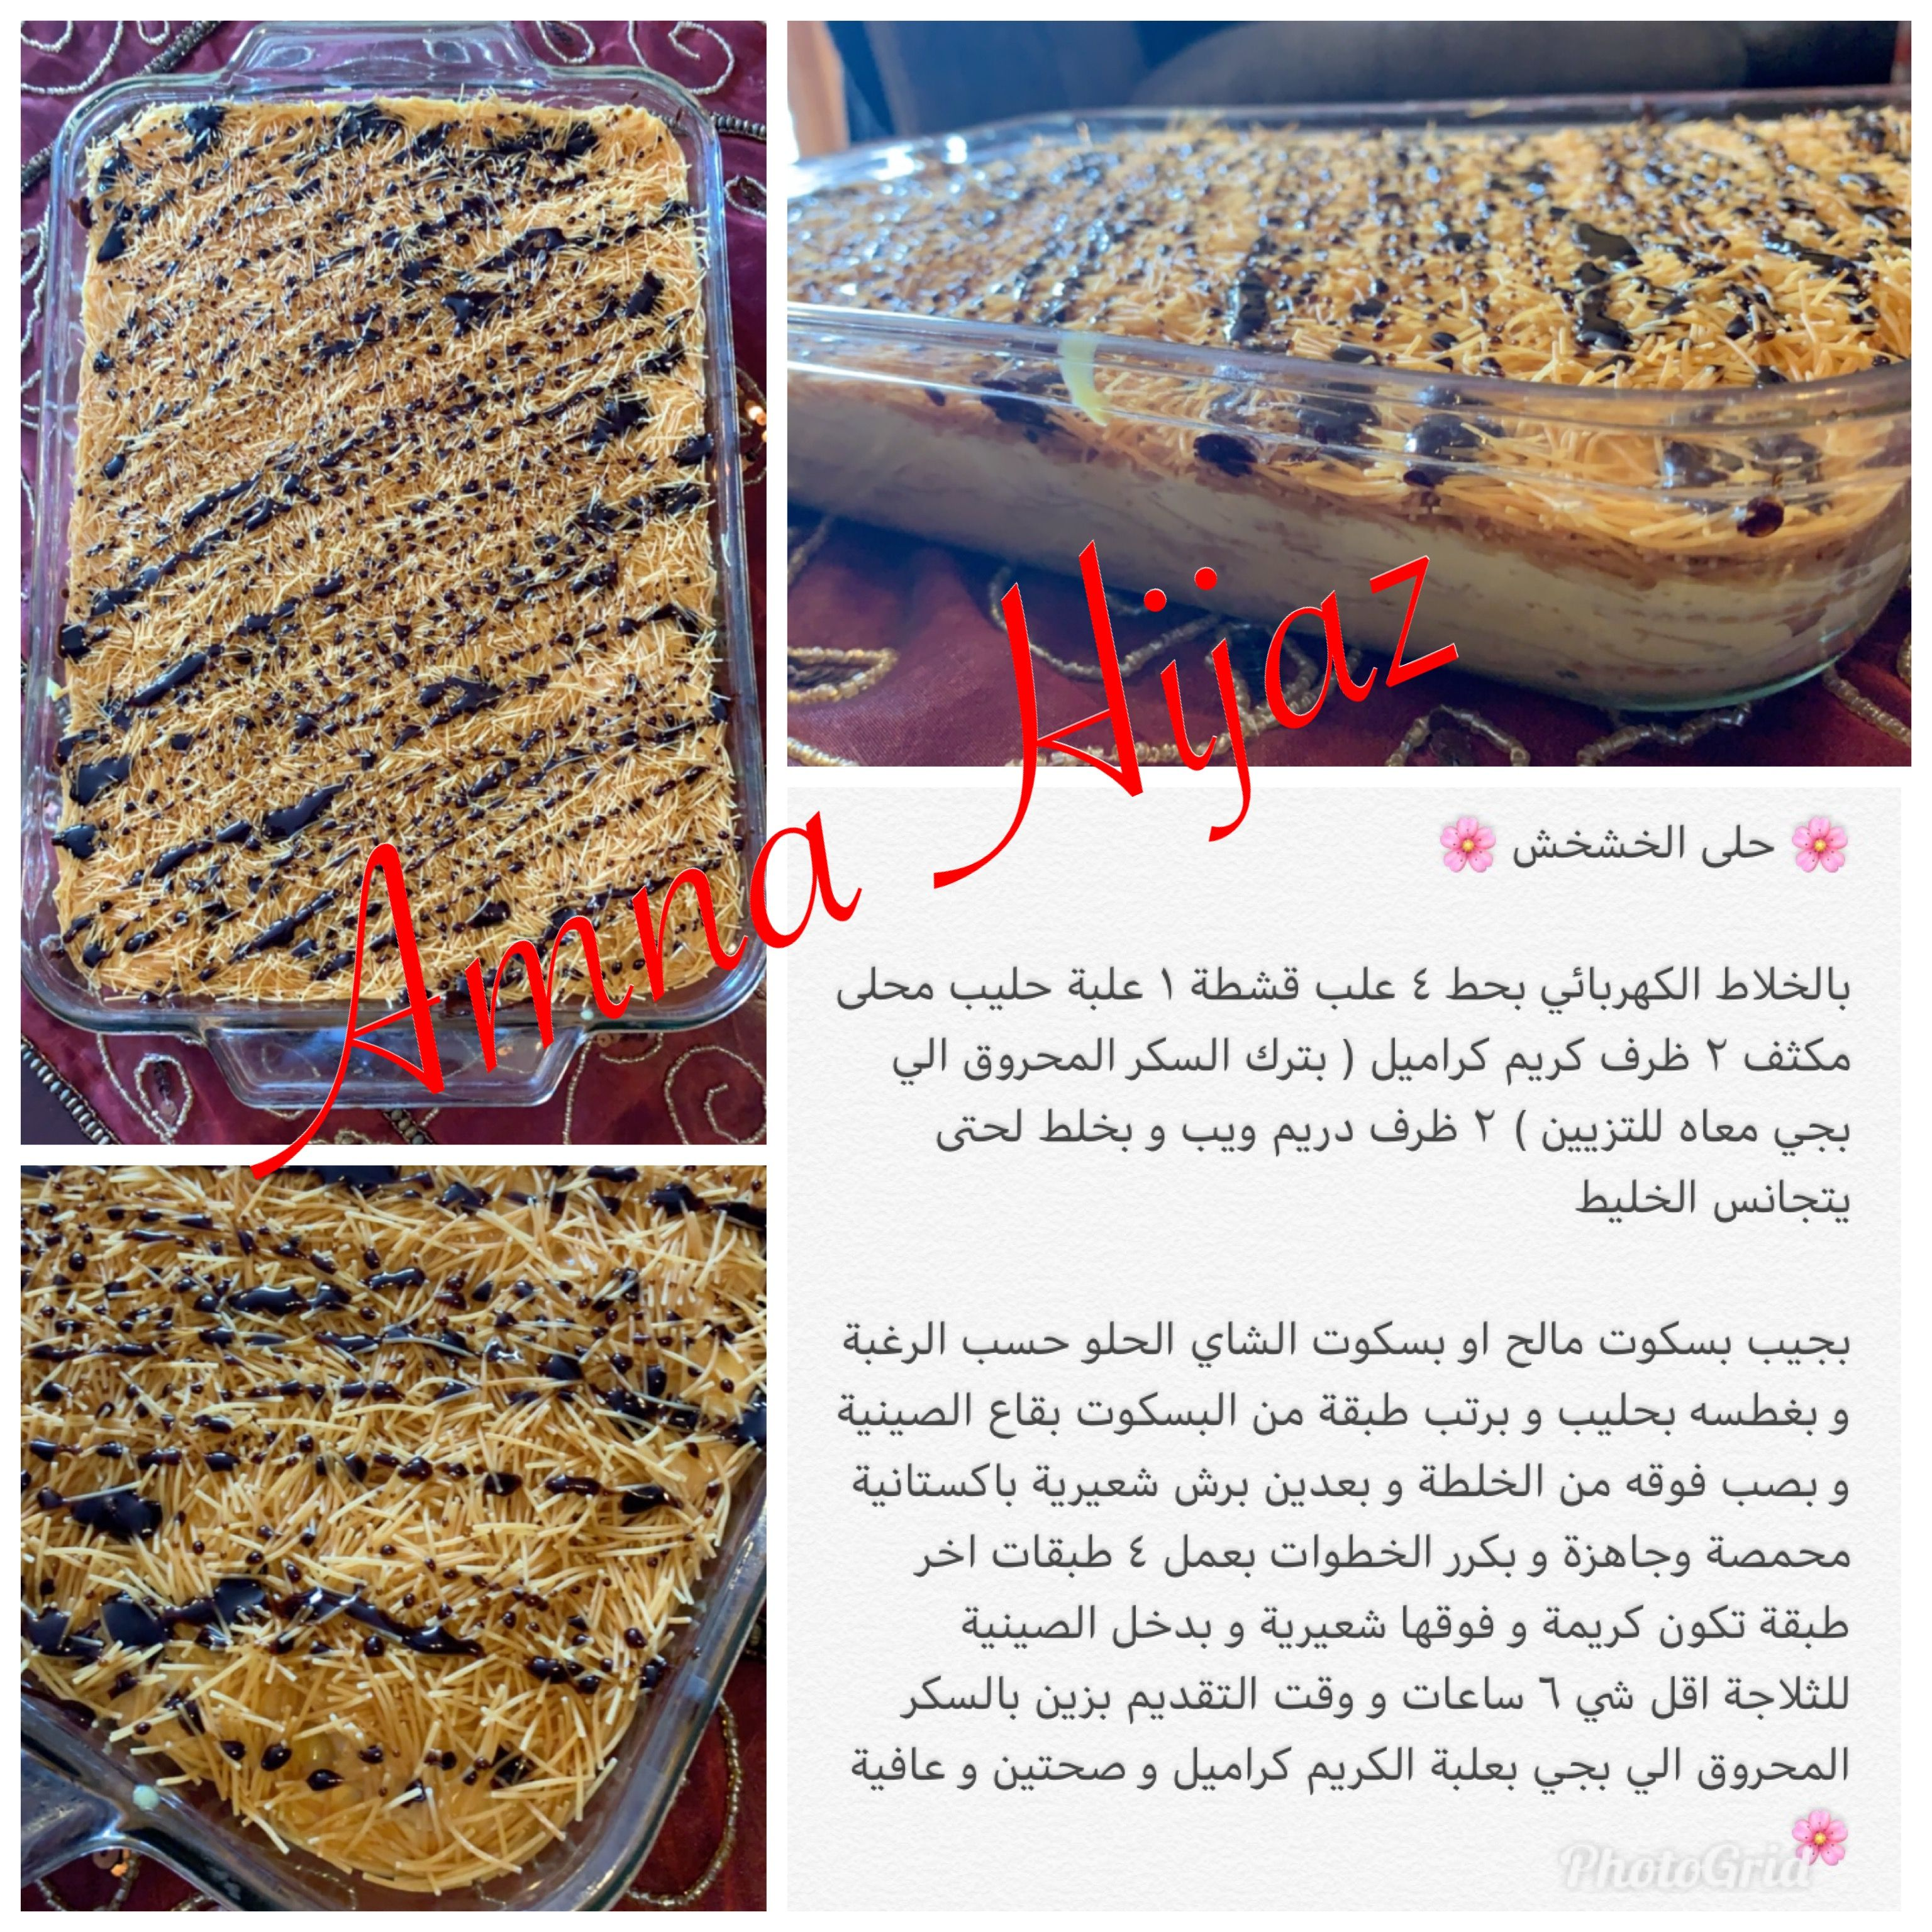 حلى الخشخش Dessert Recipes My Recipes Recipes